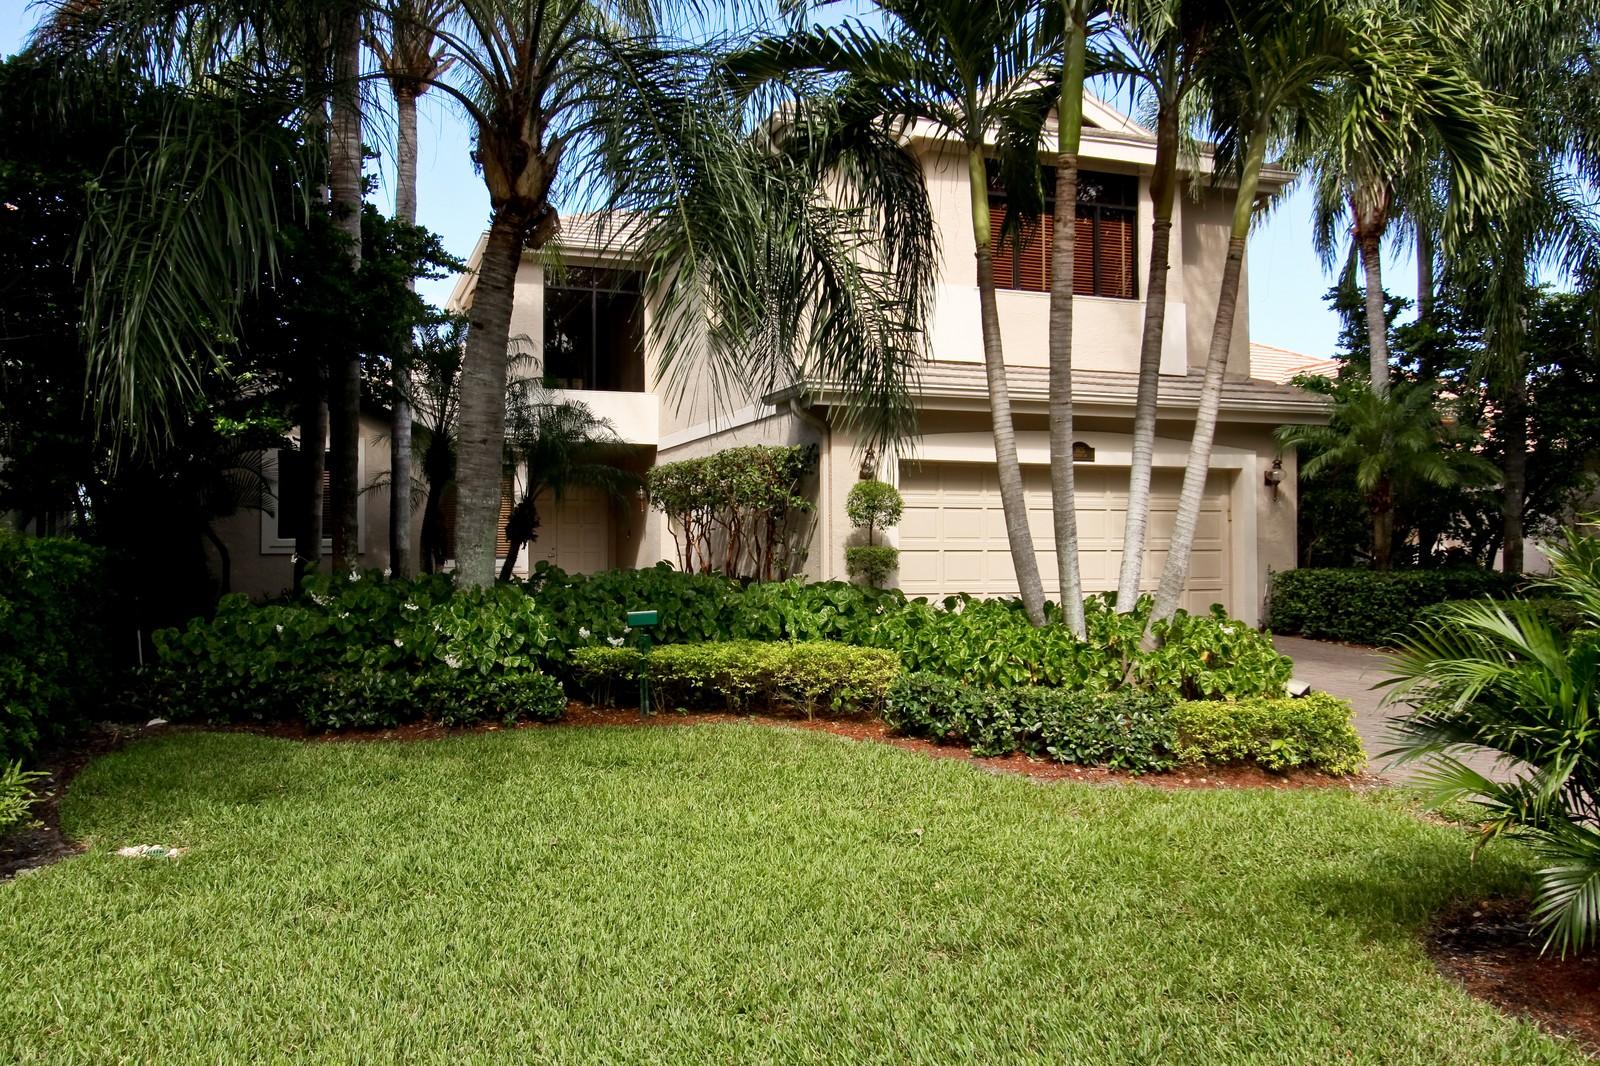 Famous Palm Beach Gardens Fl 33410 Photos - Beautiful Garden - dlix.us